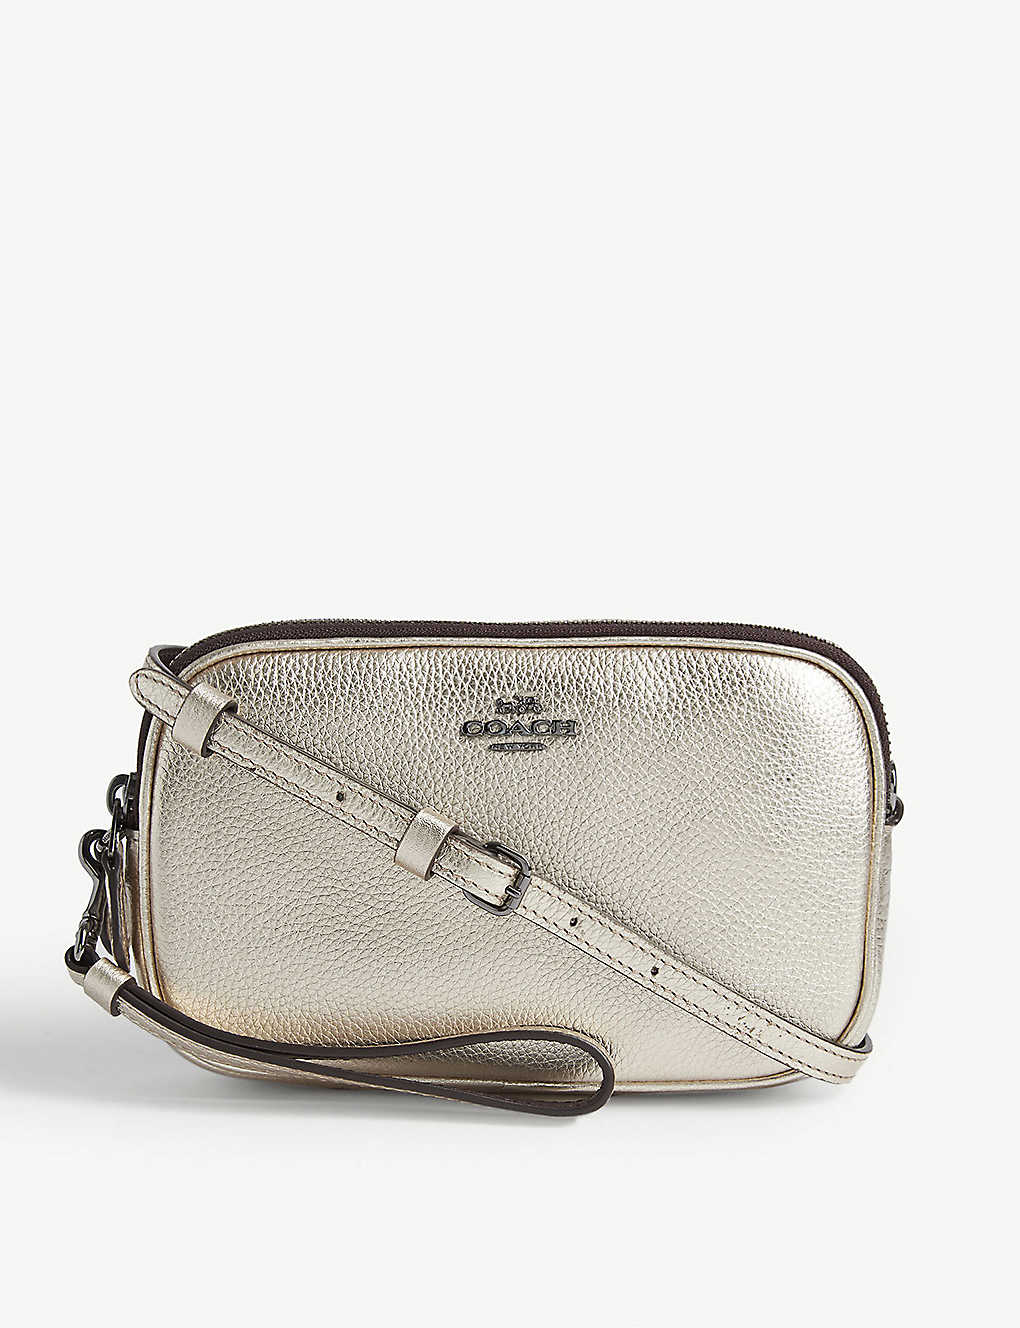 e9eb1b7b4e COACH - Metallic leather cross-body bag   Selfridges.com